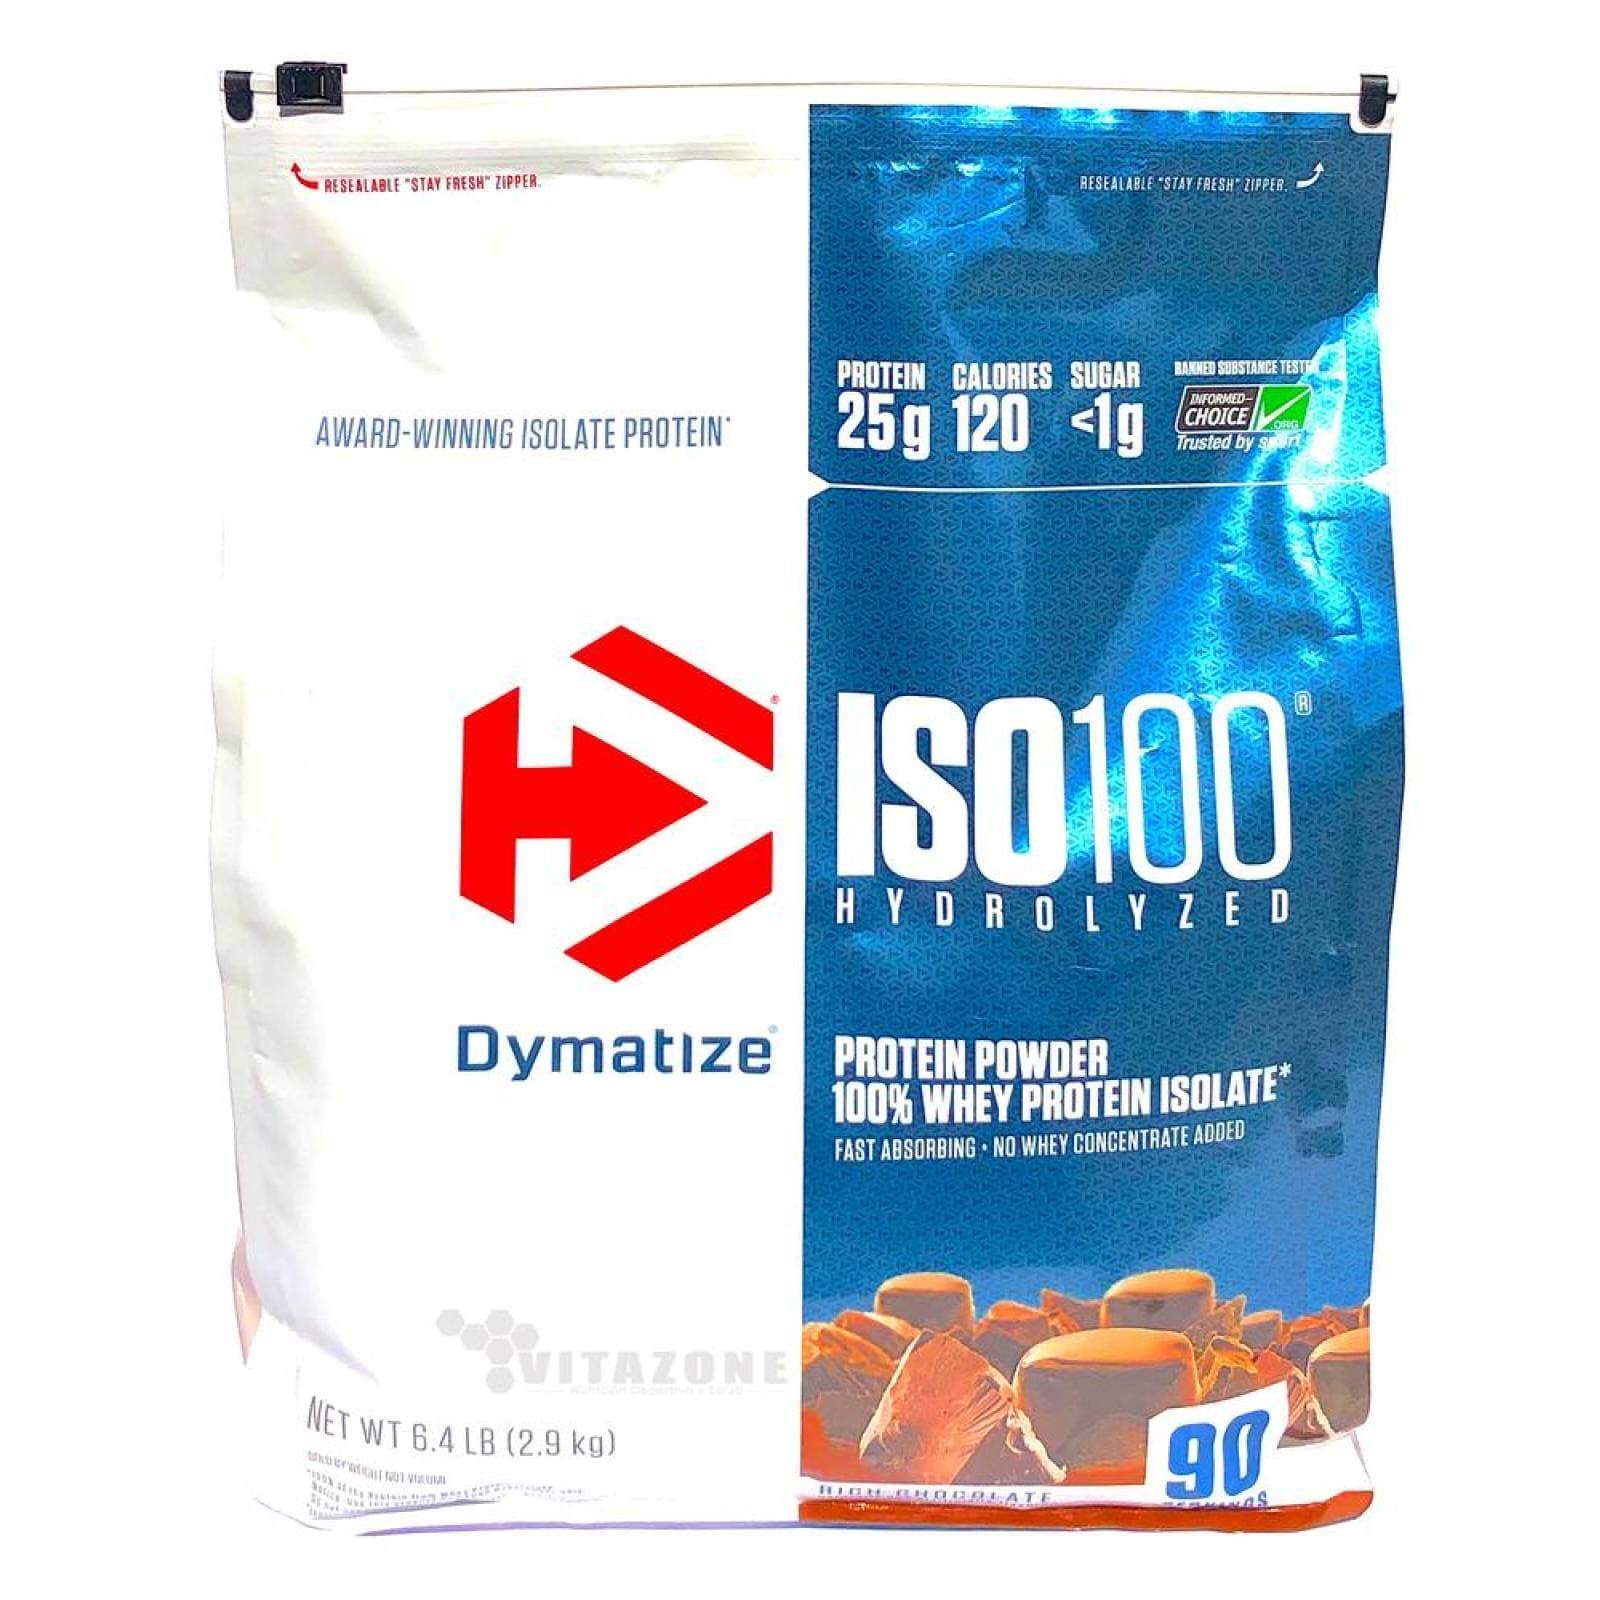 Proteína ISO 100 Hydrolyzed 6Lbs Chocolate Dymatize